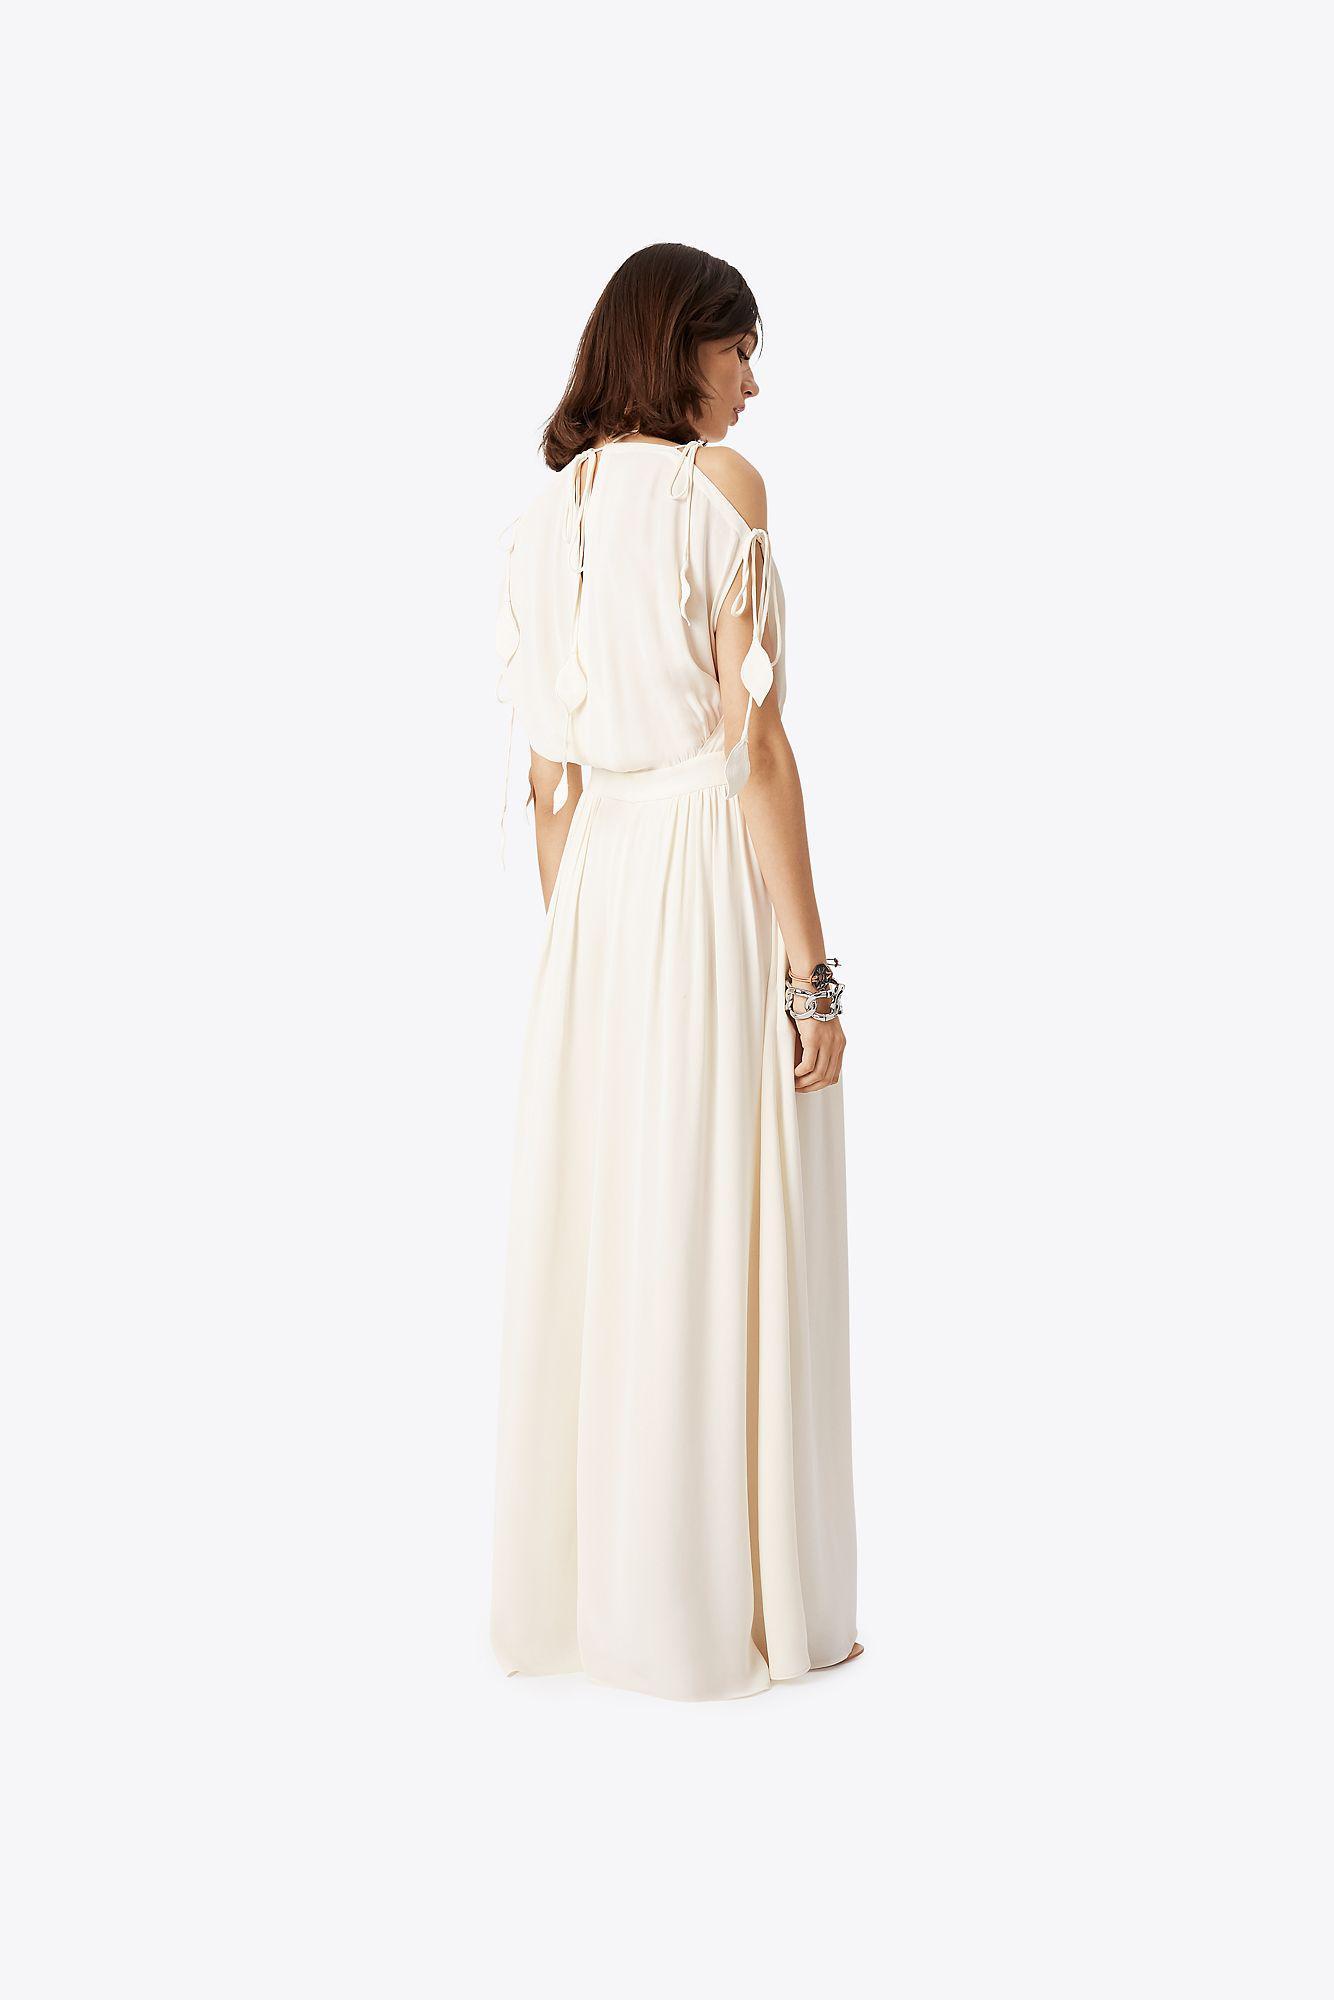 5c41e61e52 Tory Burch - White Evalene Tie-shoulder Dress - Lyst. View fullscreen